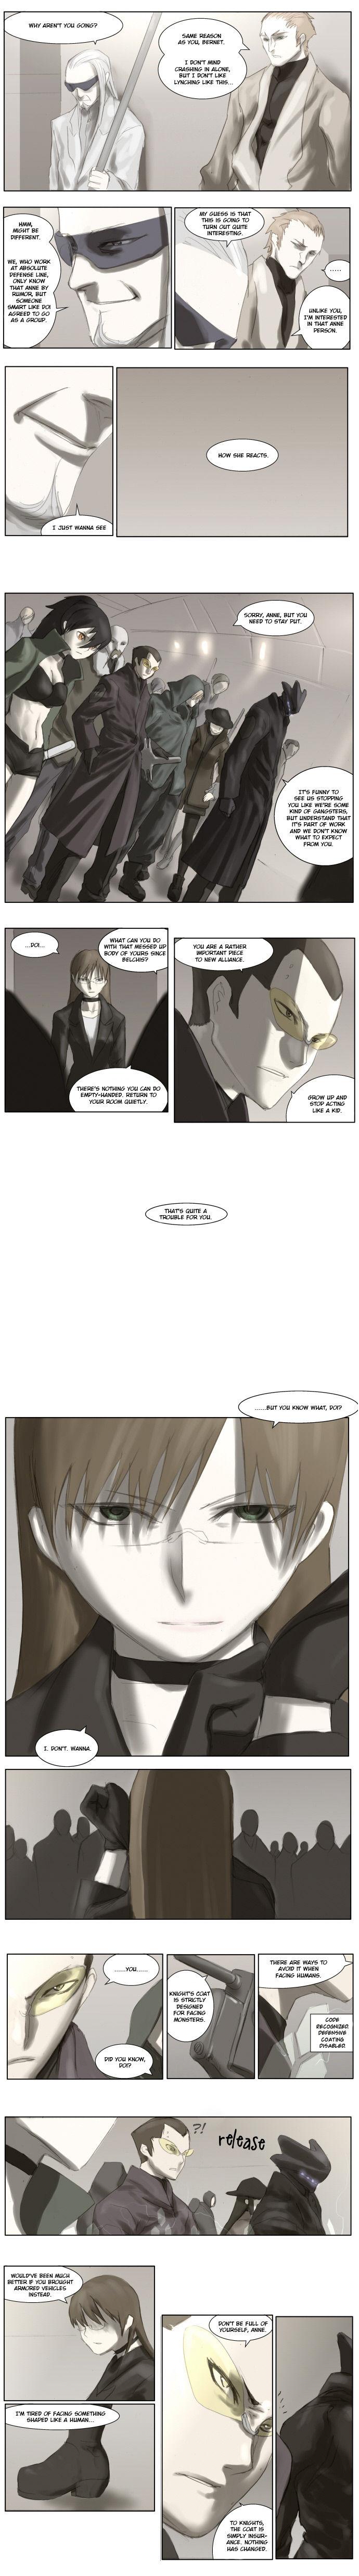 Knight Run 32 Page 2